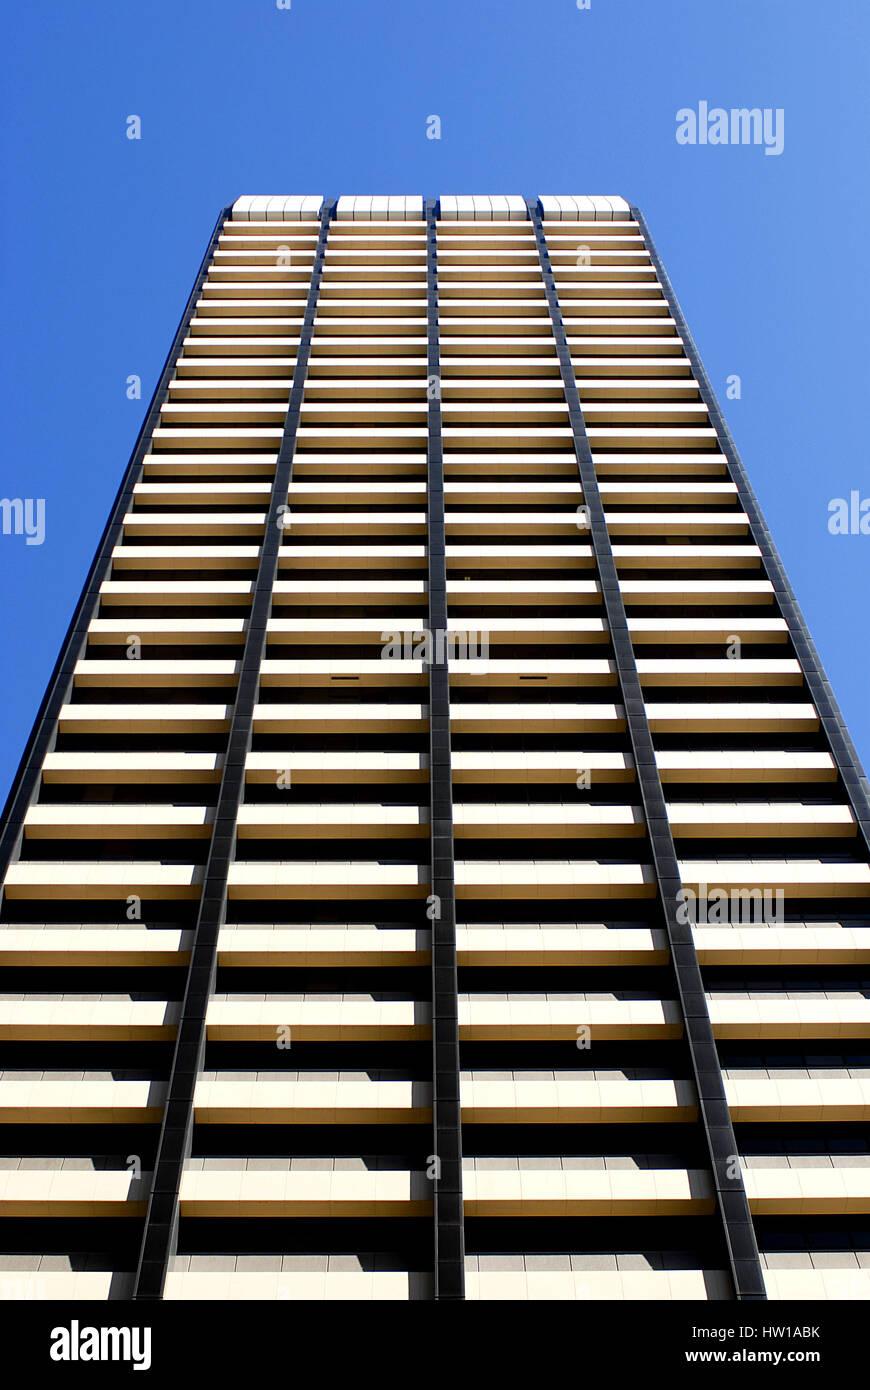 Skyscraper, Wolkenkratzer - Stock Image